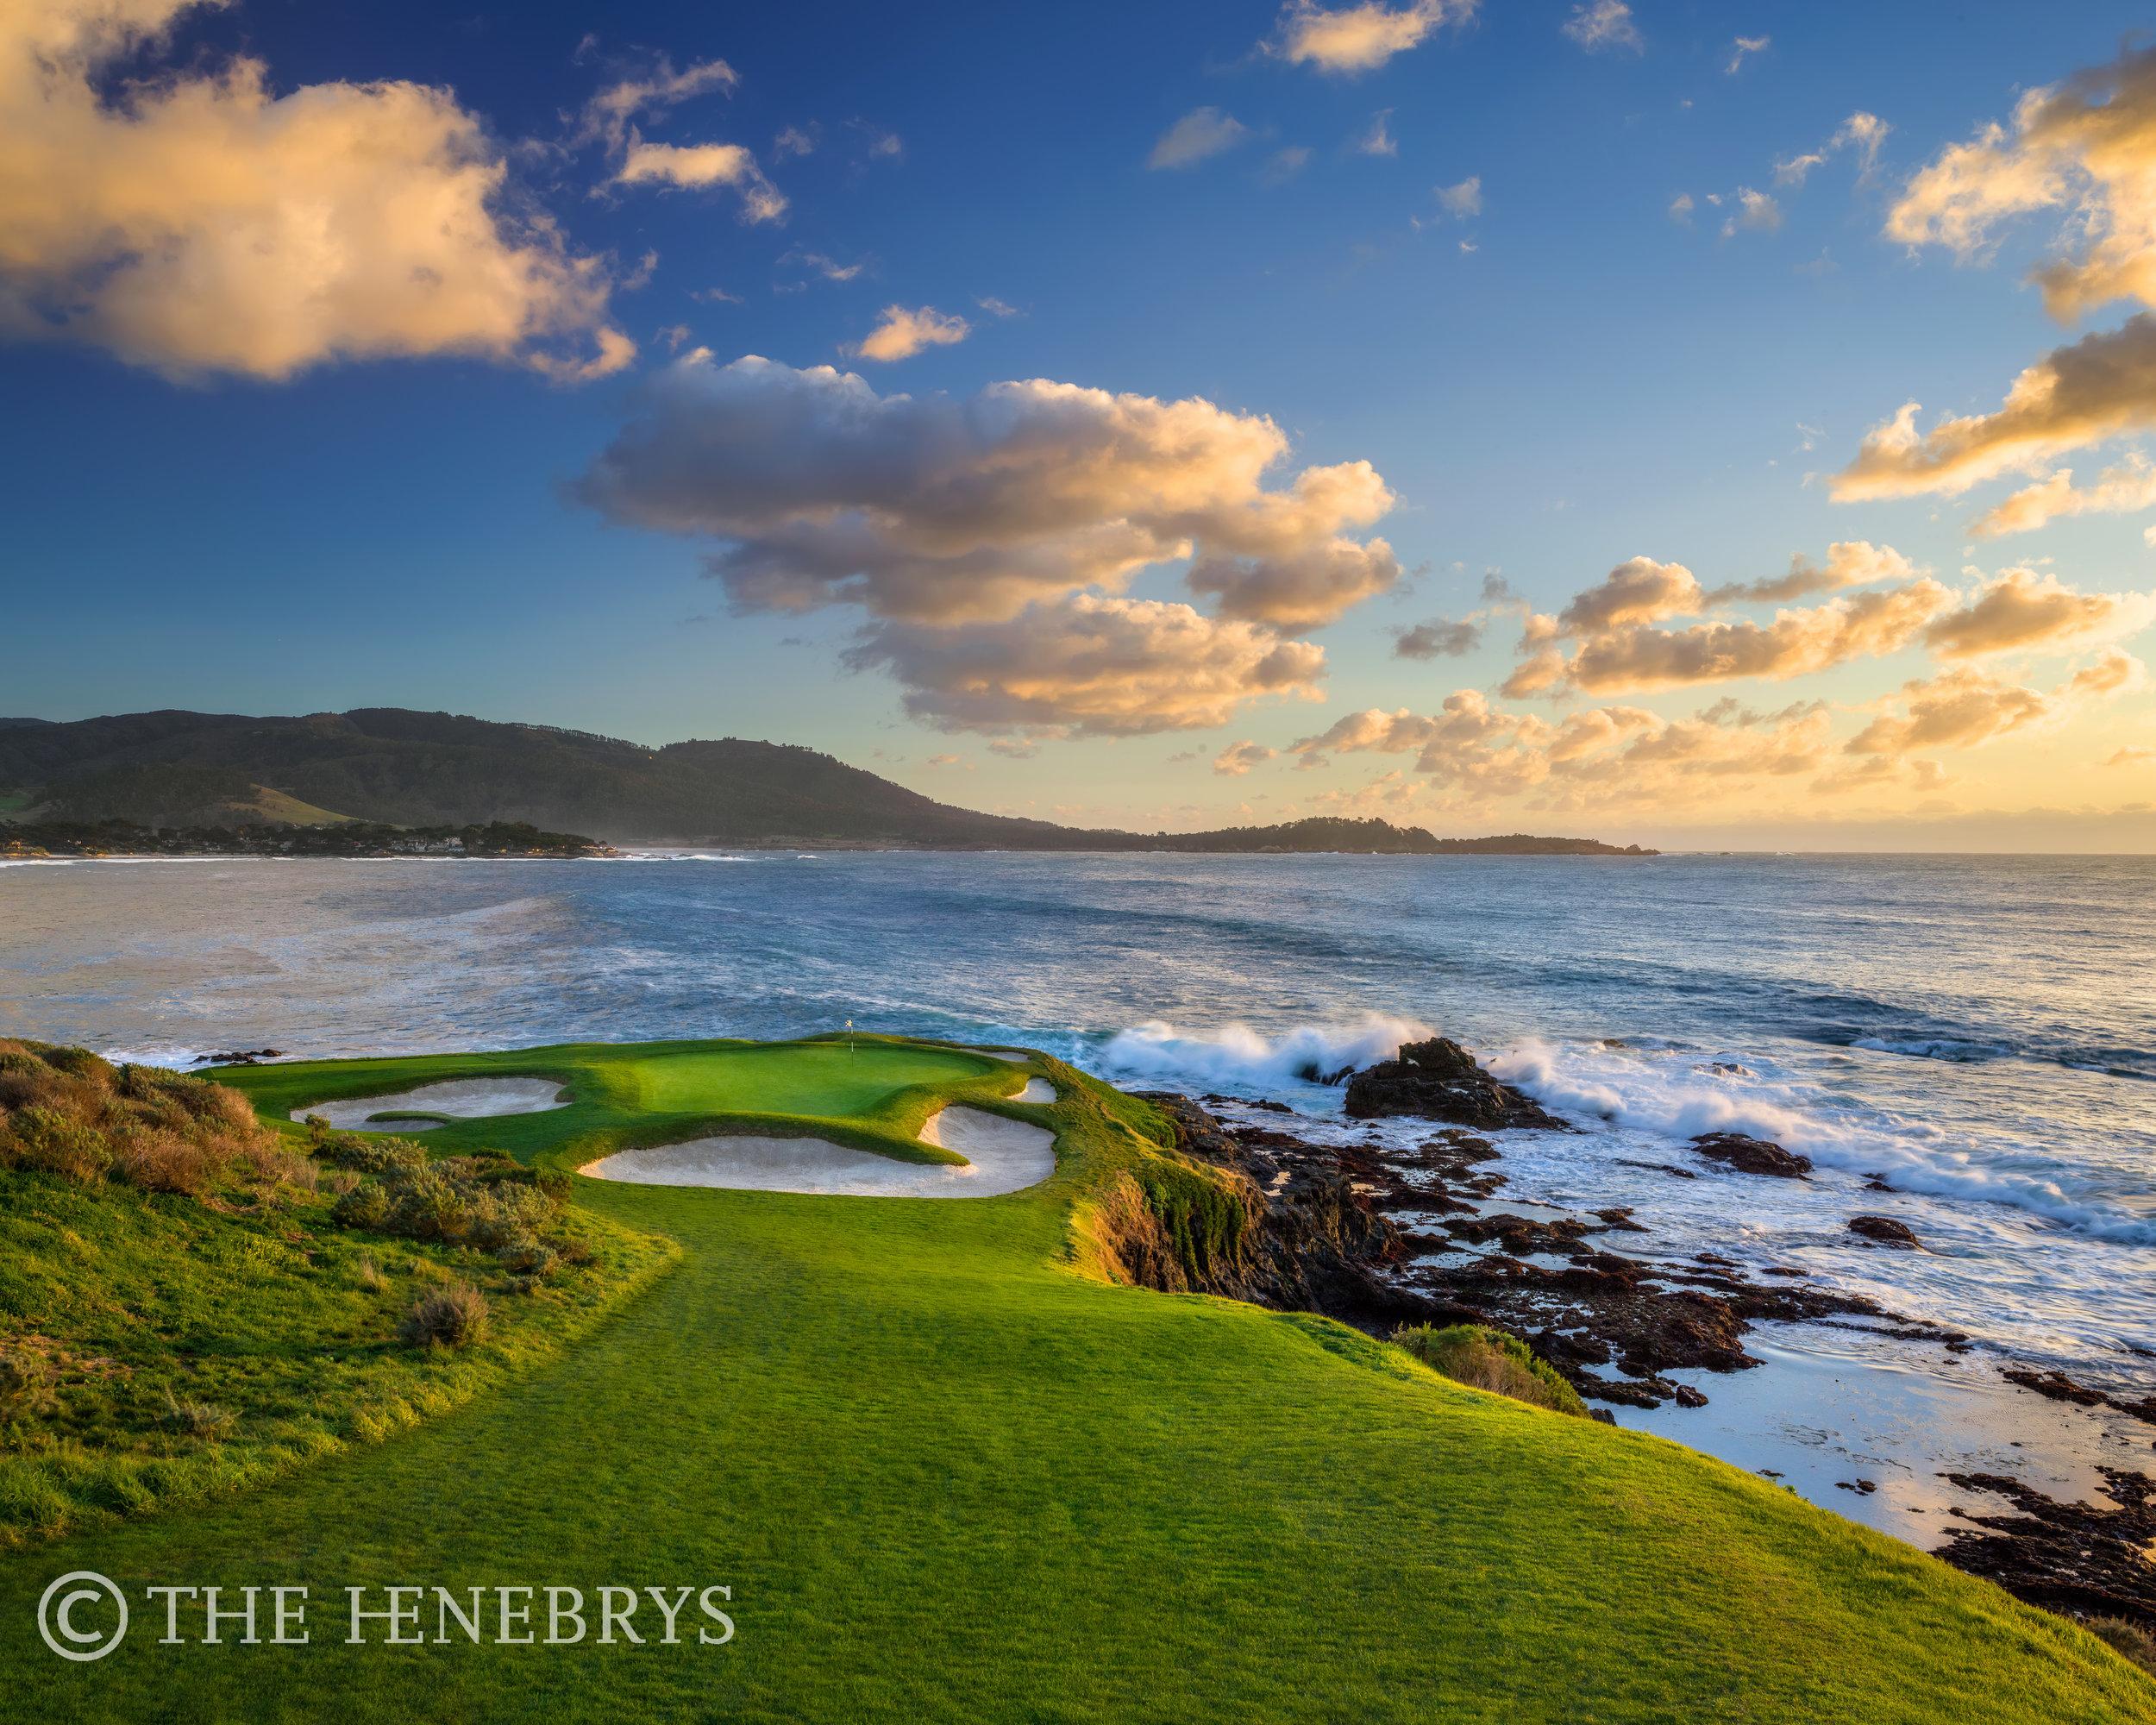 """Evening Glow"" #07 Pebble Beach Golf Links®, California"